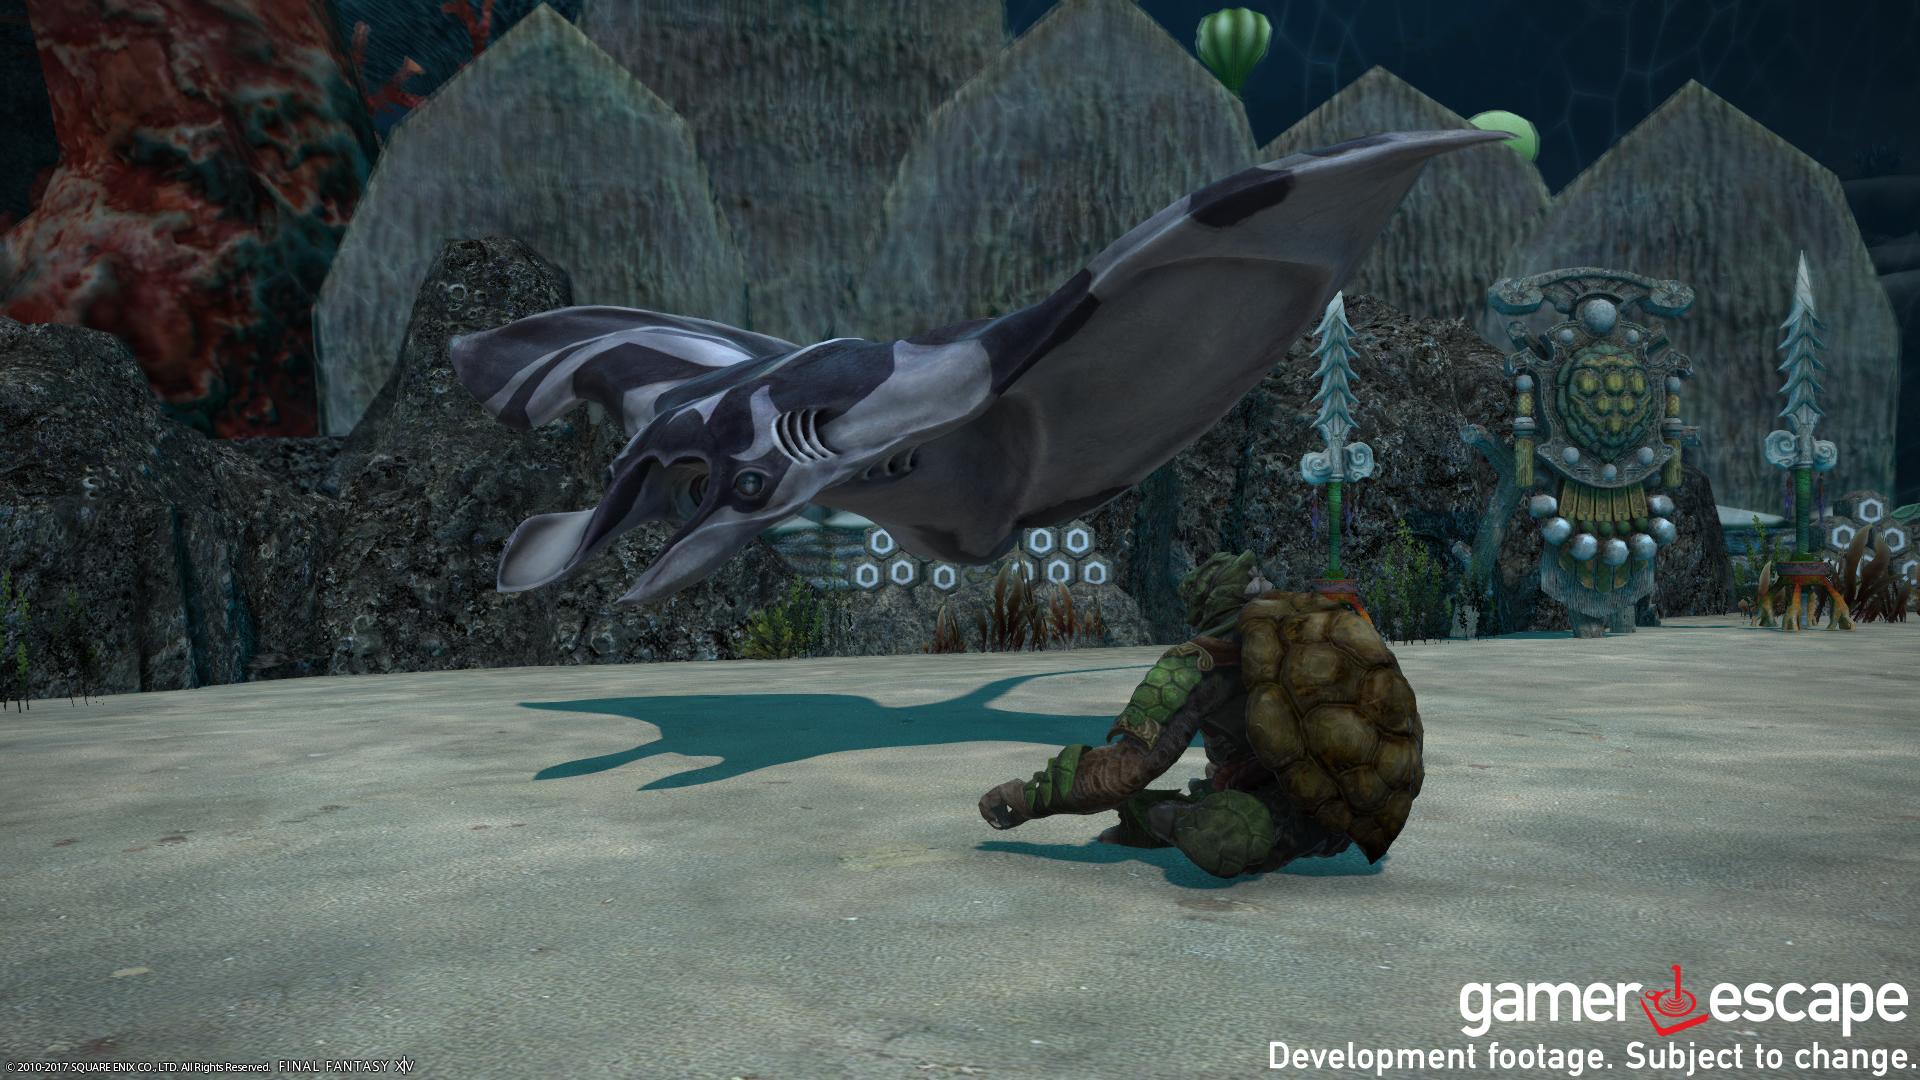 Hands-On With Final Fantasy XIV: Stormblood – Gamer Escape